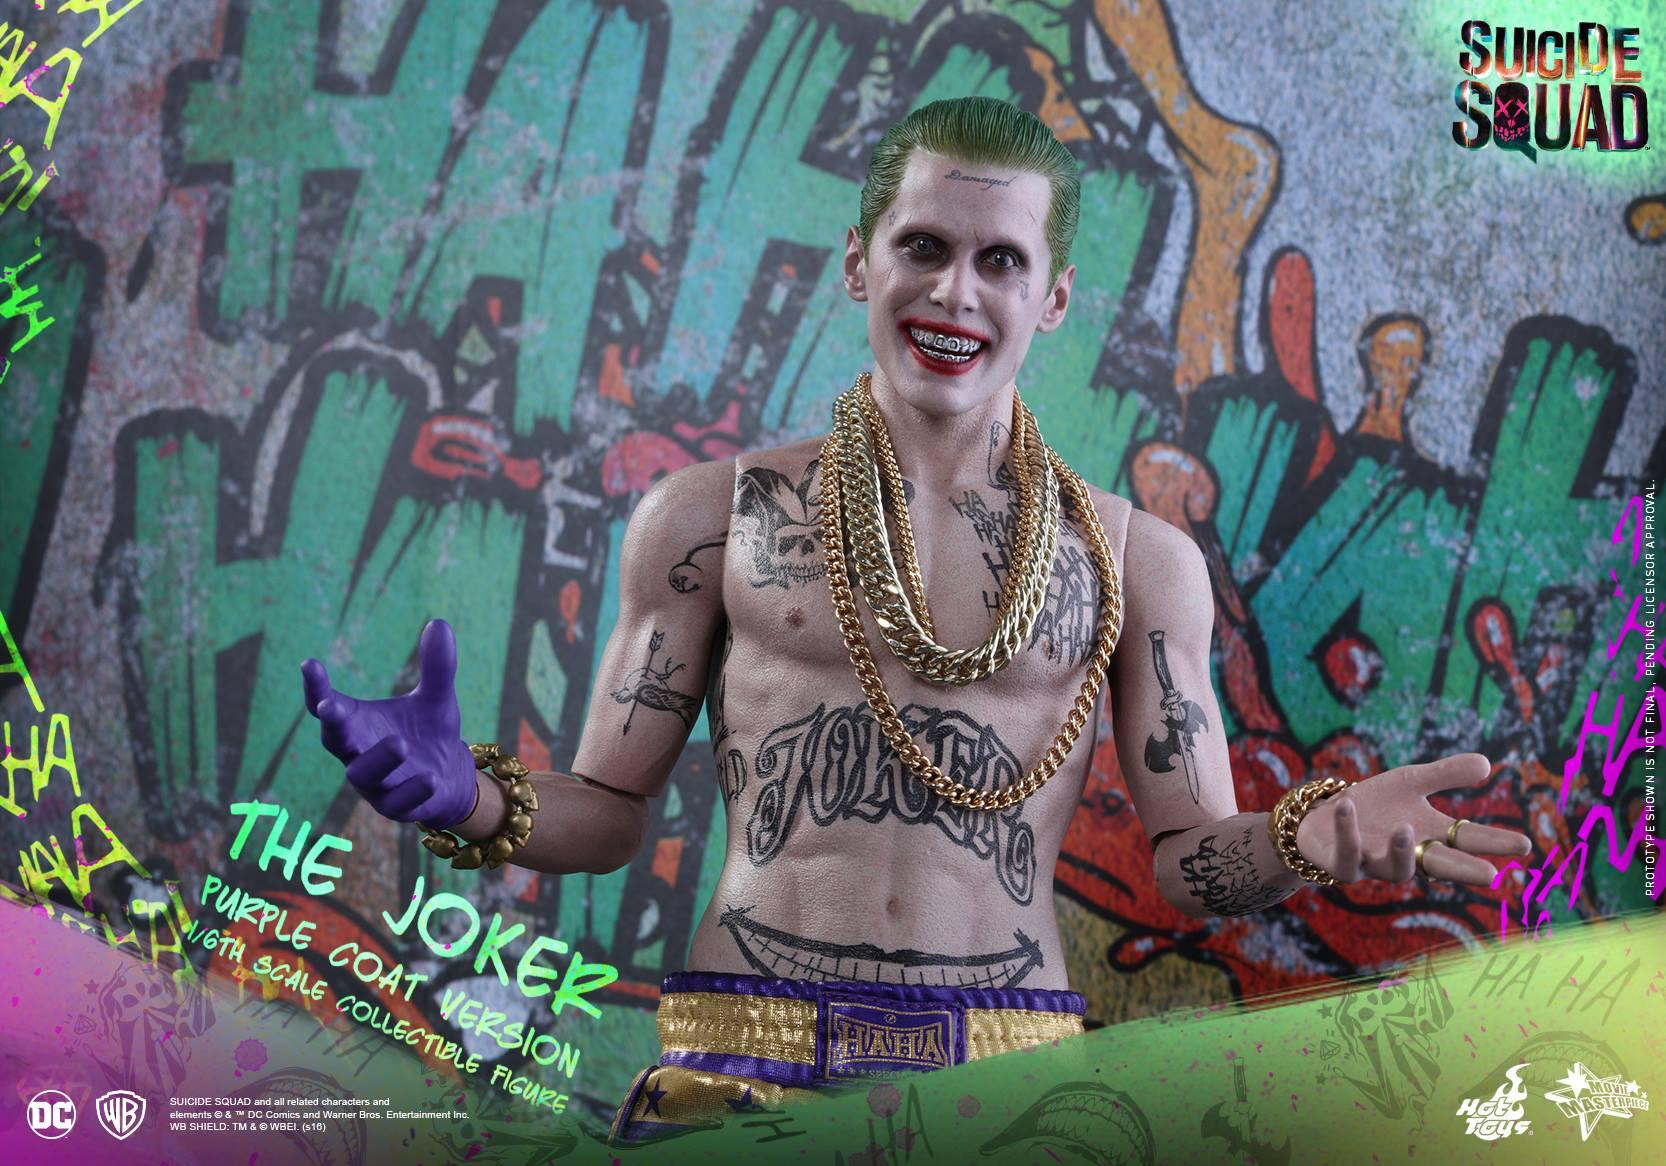 Hot-Toys-Suicide-Squad-Joker-Purple-Coat-2